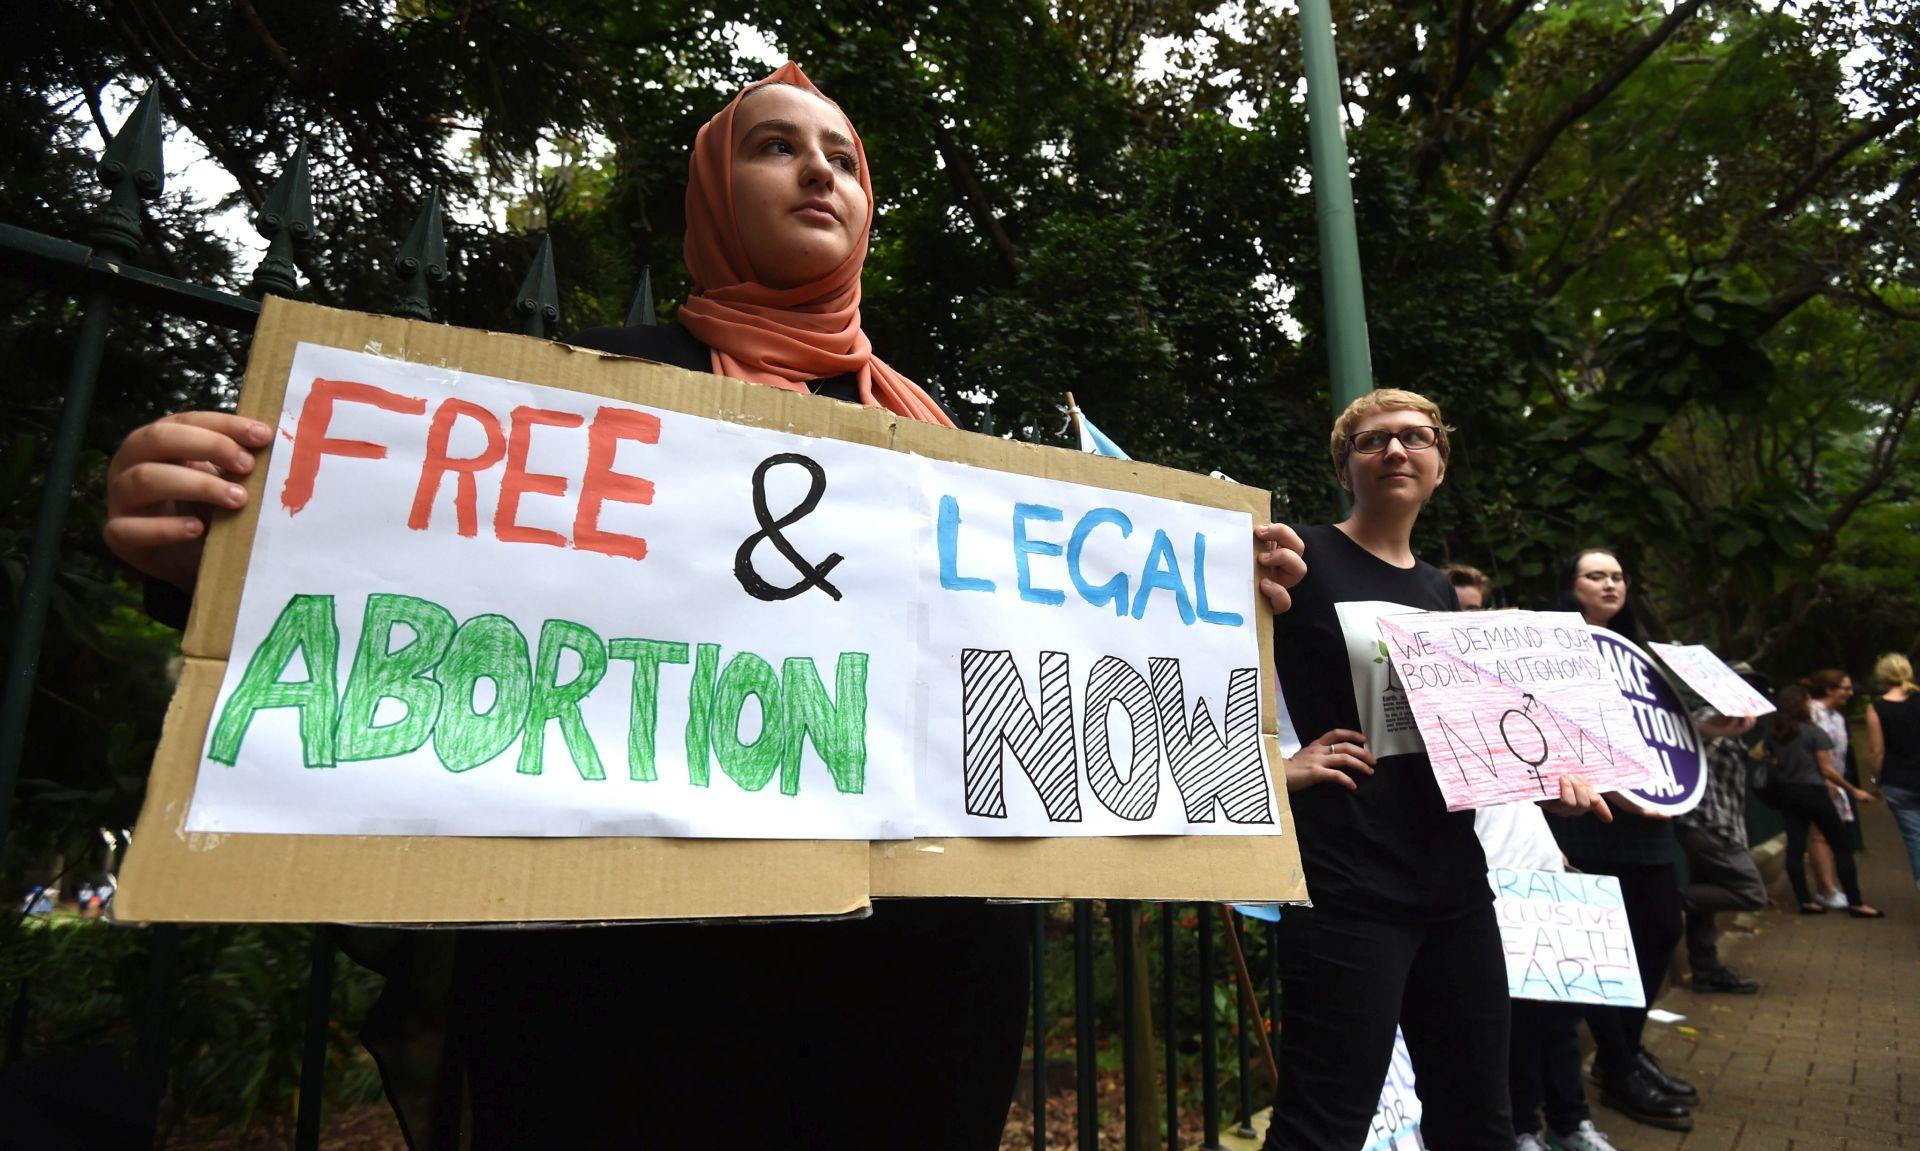 Četiri europske države suprotstavljaju se Trumpovoj uredbi o pobačaju